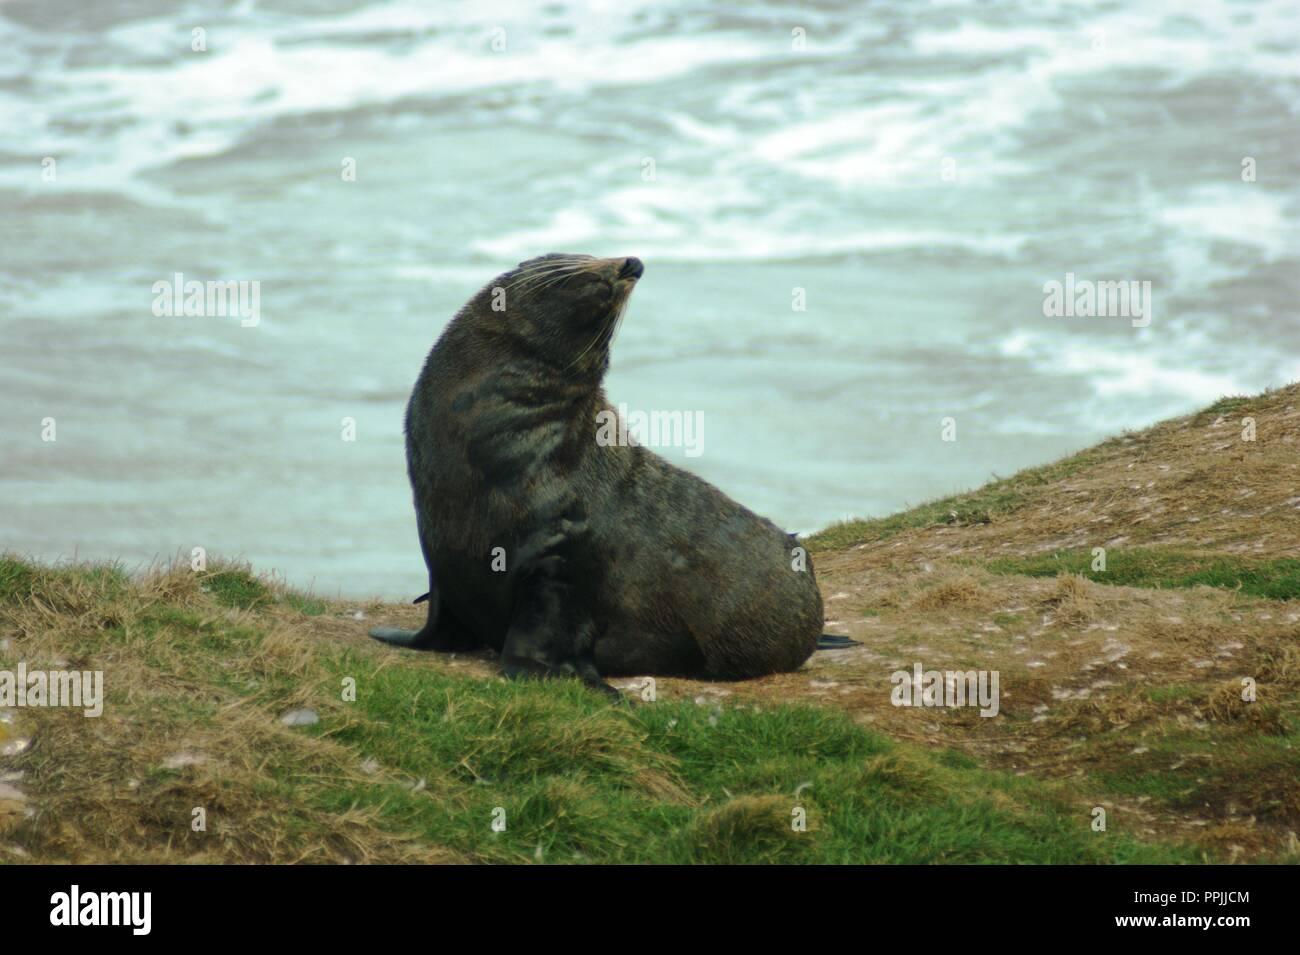 New Zealand fur seal on the Otago Peninsula, New Zealand - Stock Image